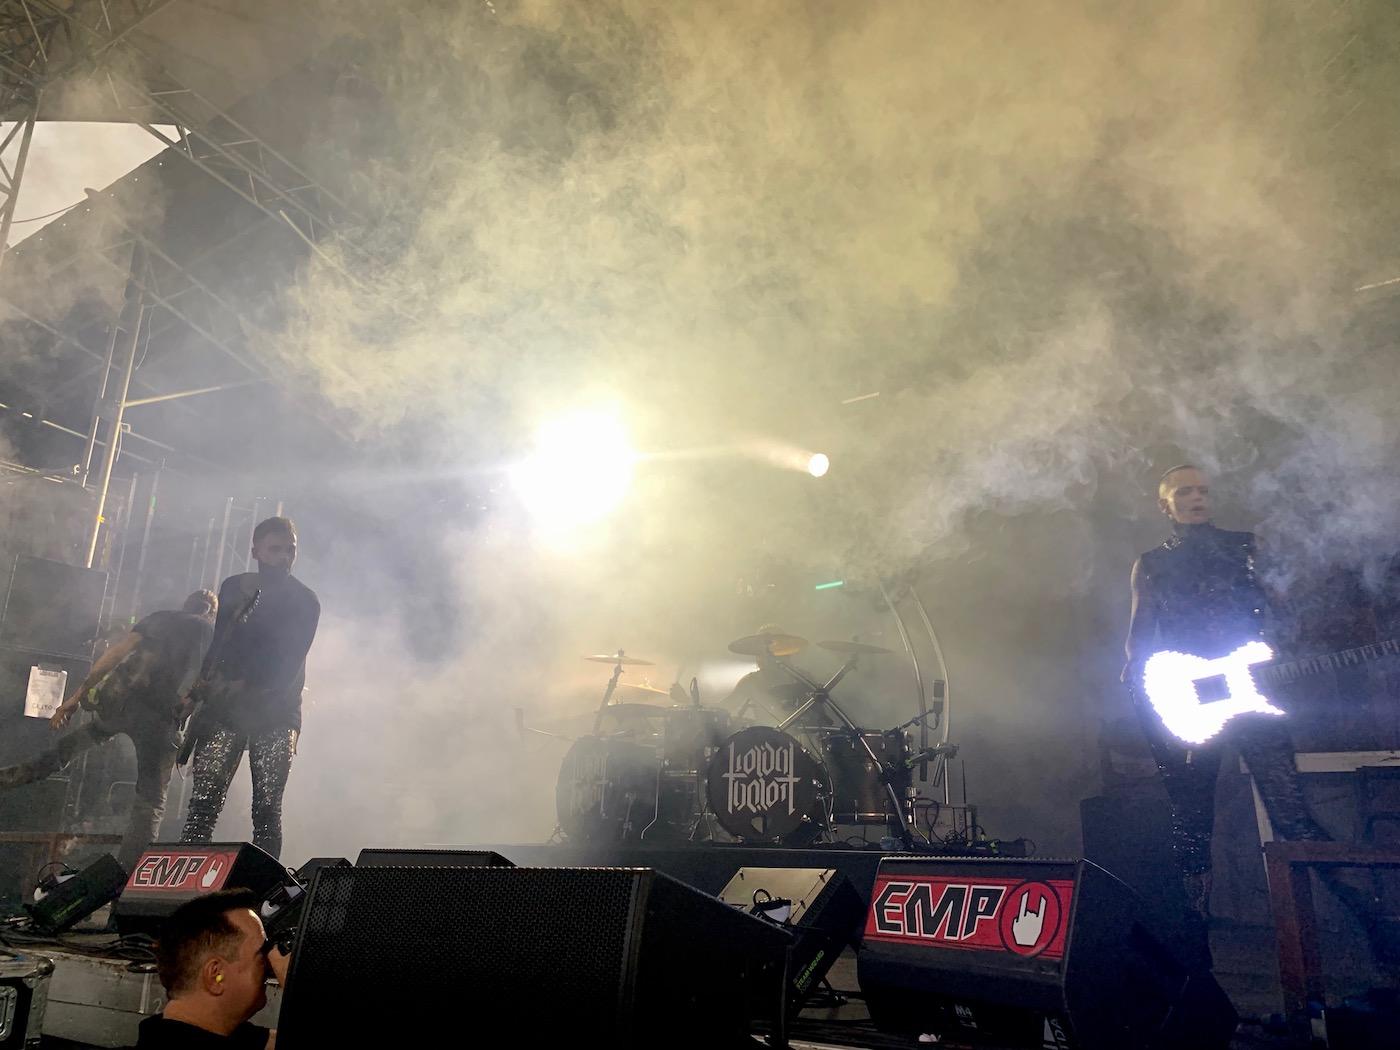 mark_benecke_amphi_festival_koeln_2019 - 67.jpg